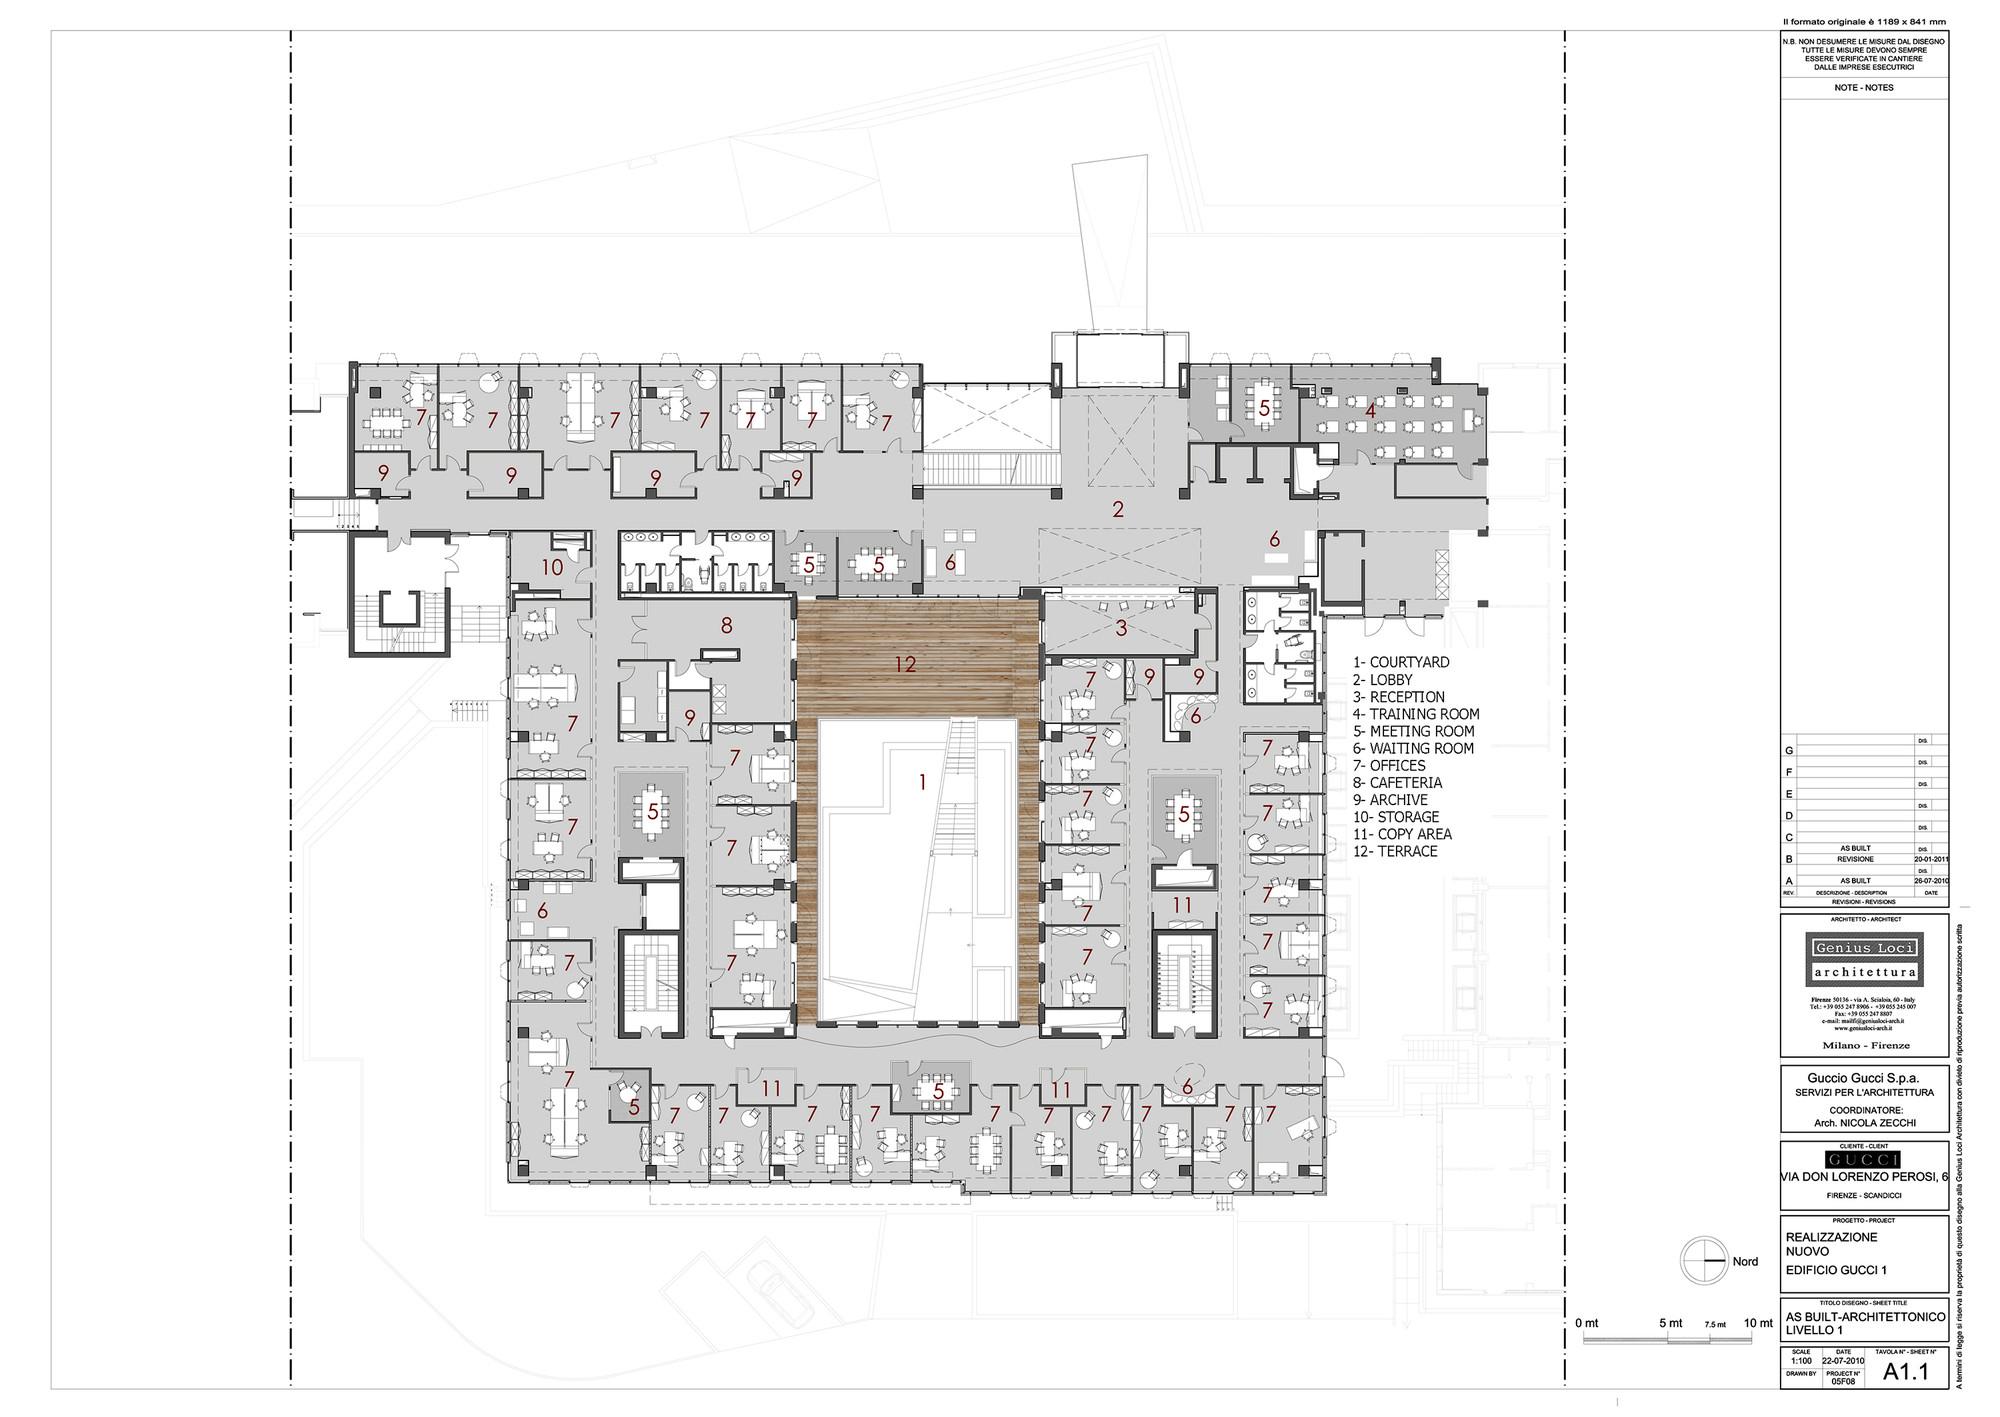 Gallery of Gucci Headquarters / Genius Loci Architettura - 13